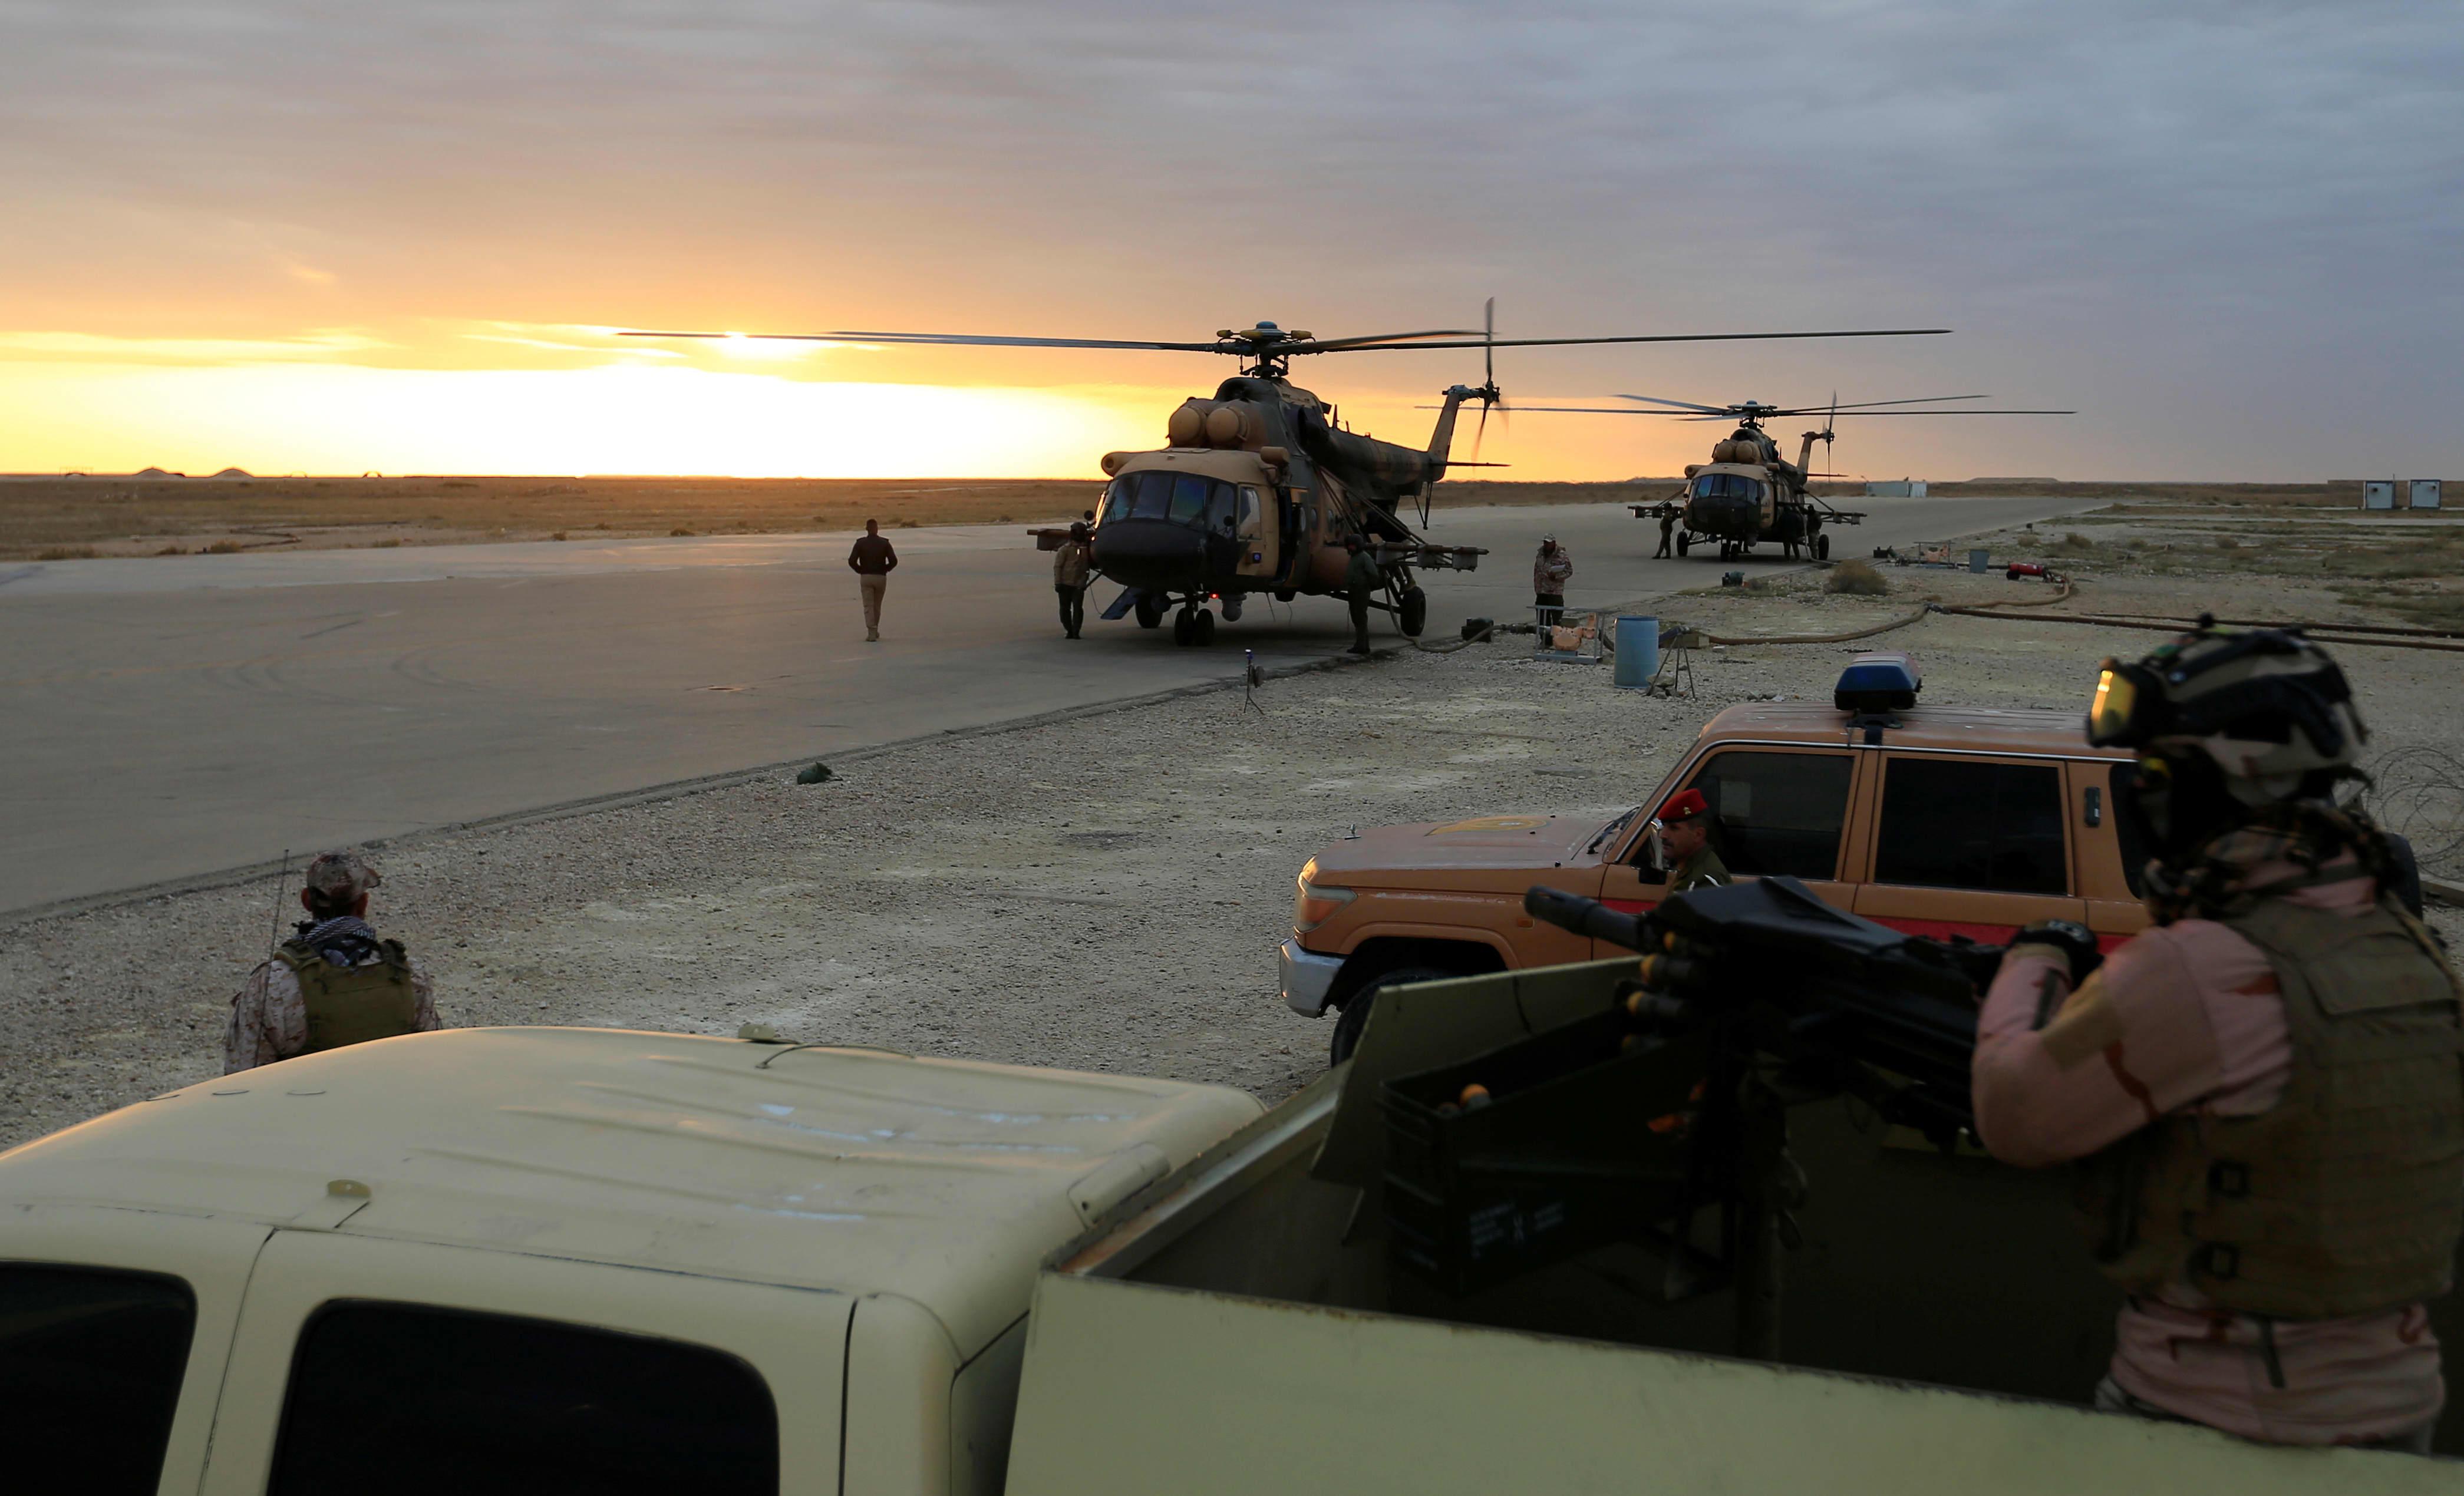 Pentagon confirms 10 rockets struck Iraqi base housing U.S. troops